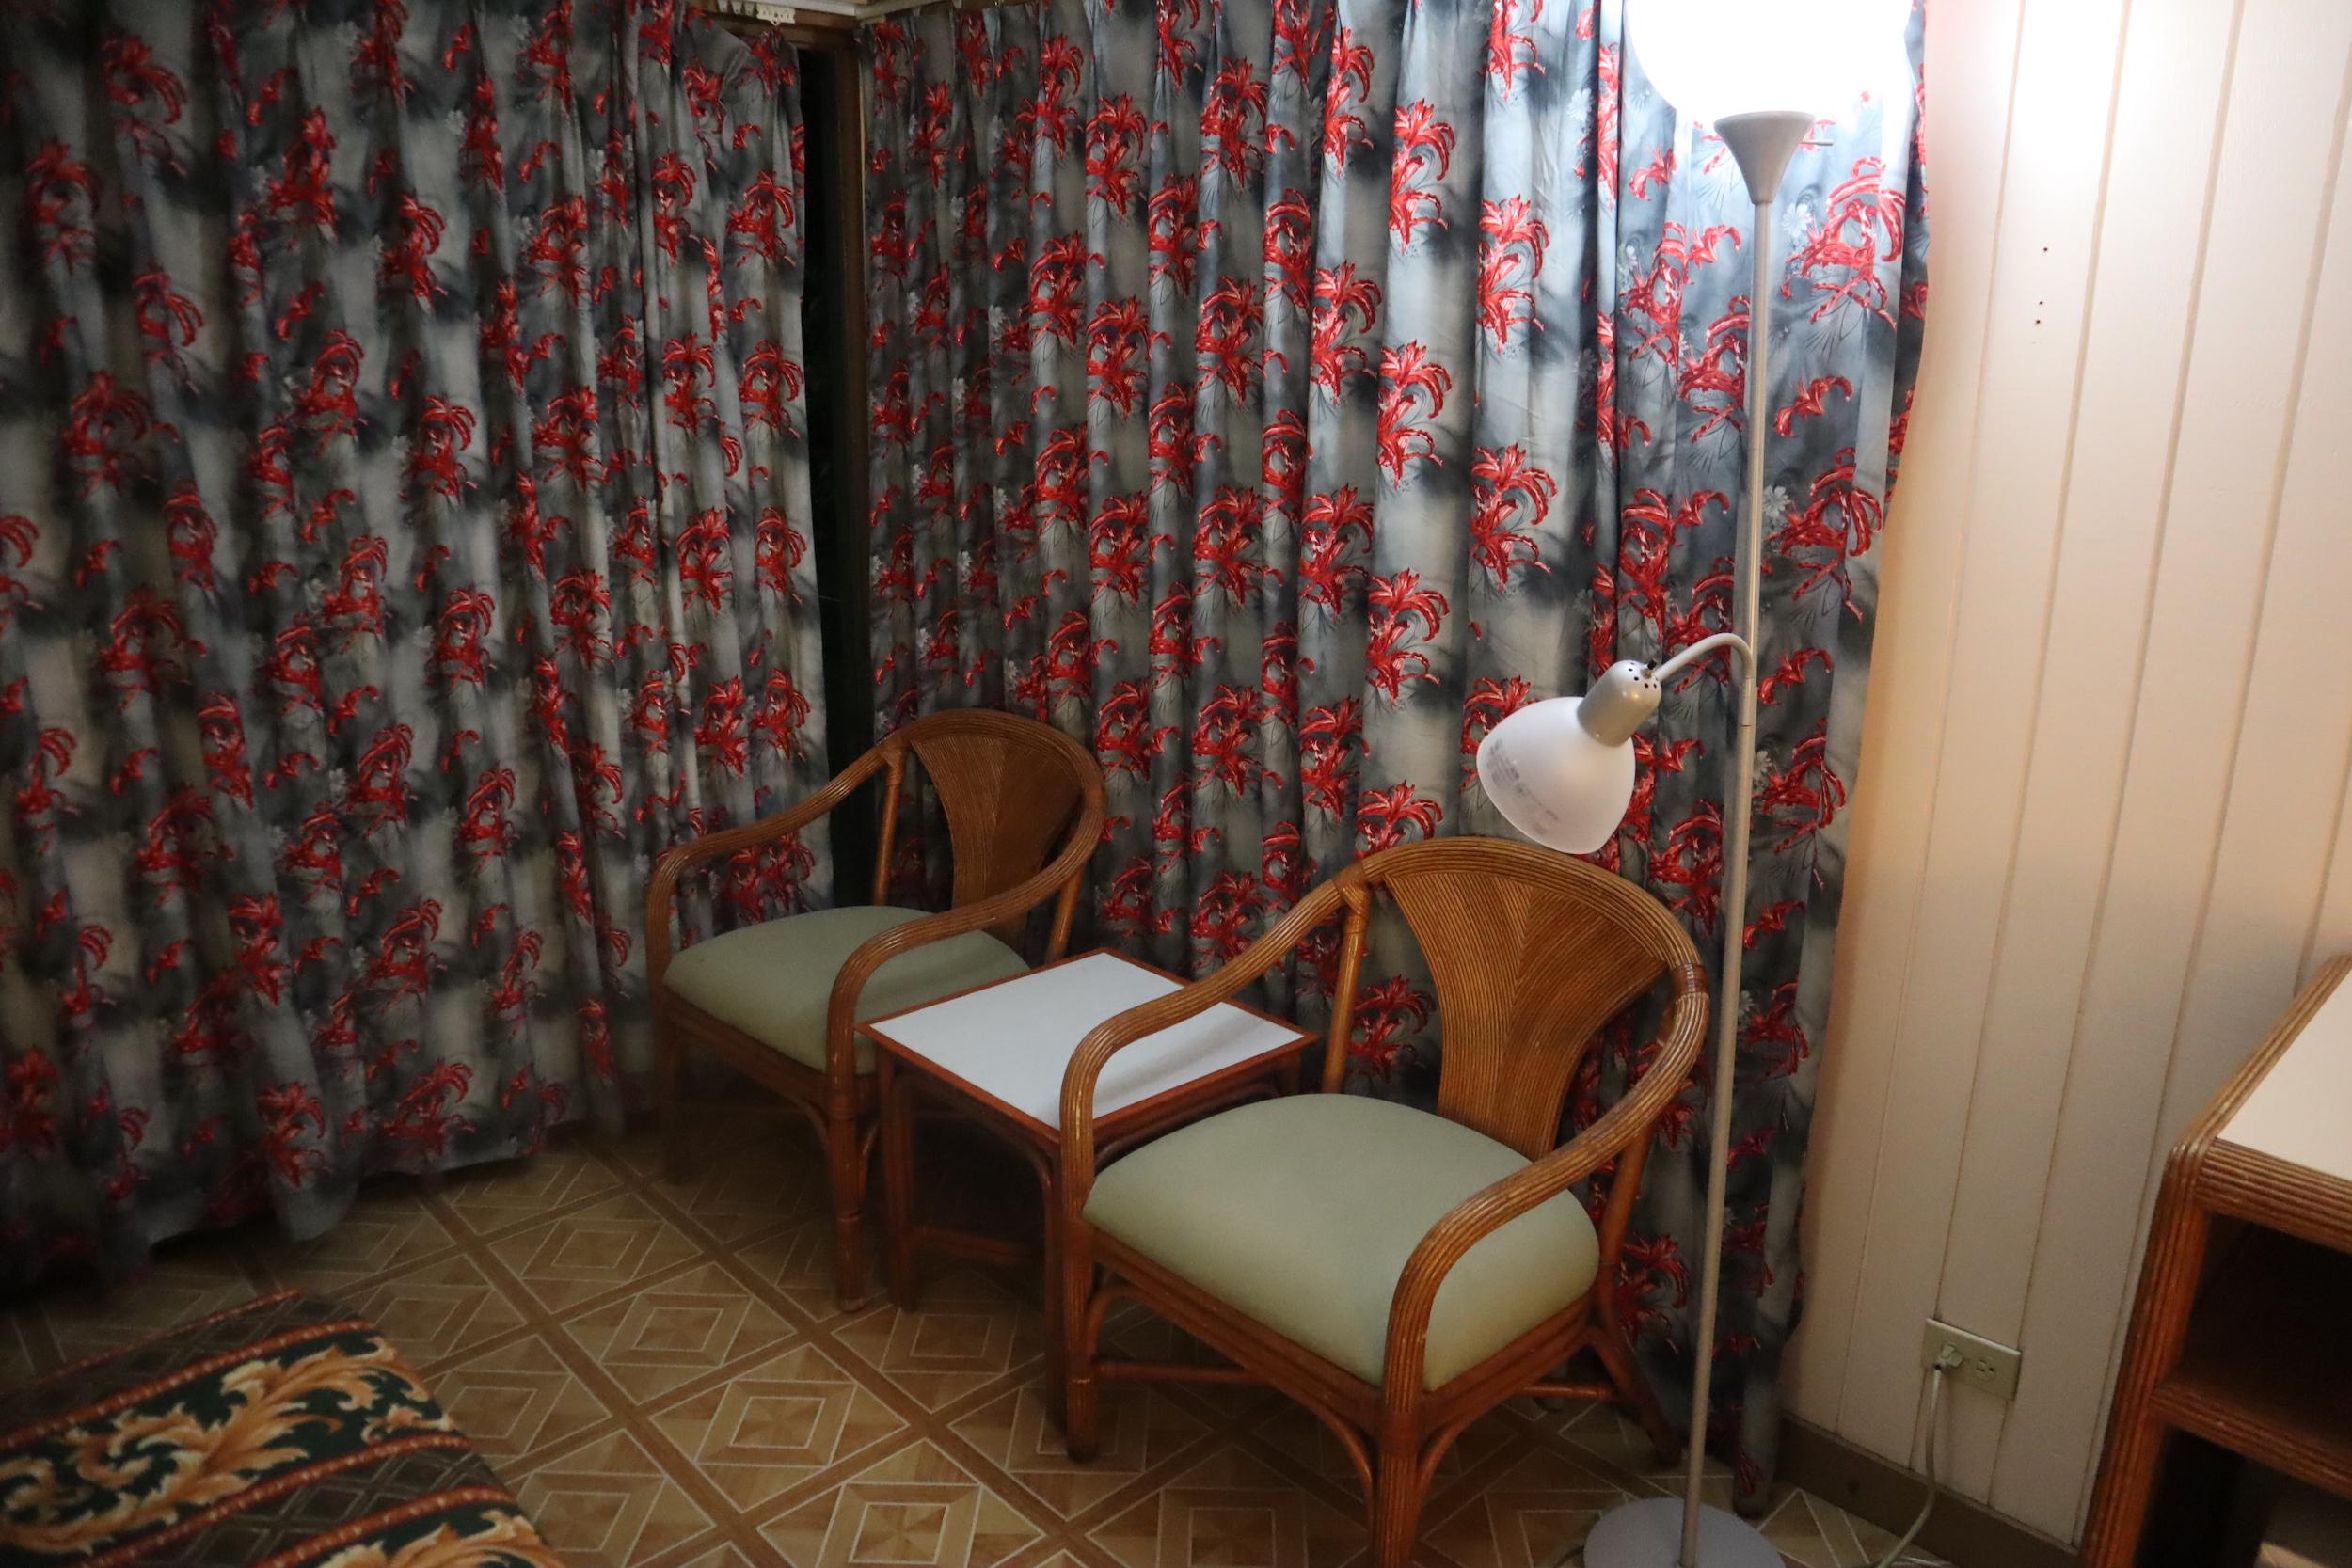 Blue Lagoon Dive Resort – Guest room furniture